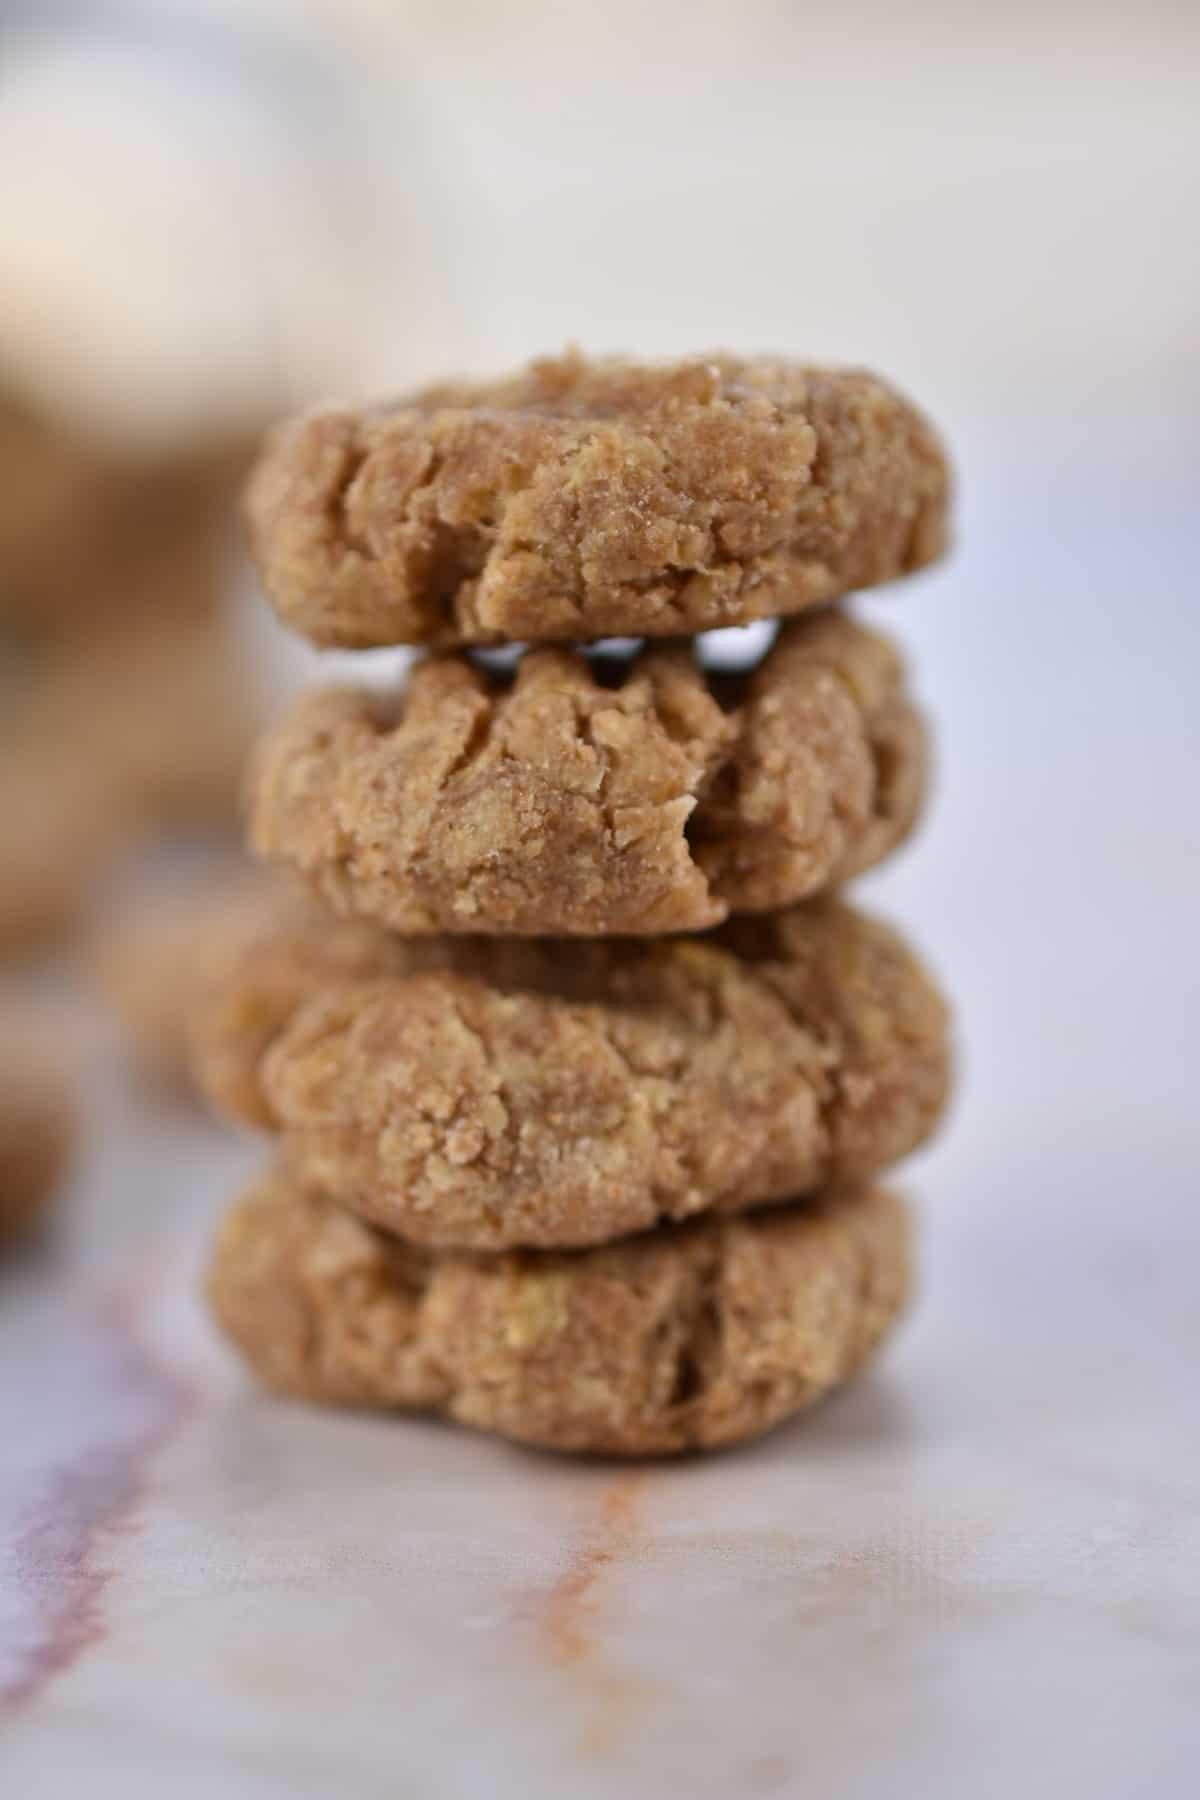 closeup image of homemade cat treats